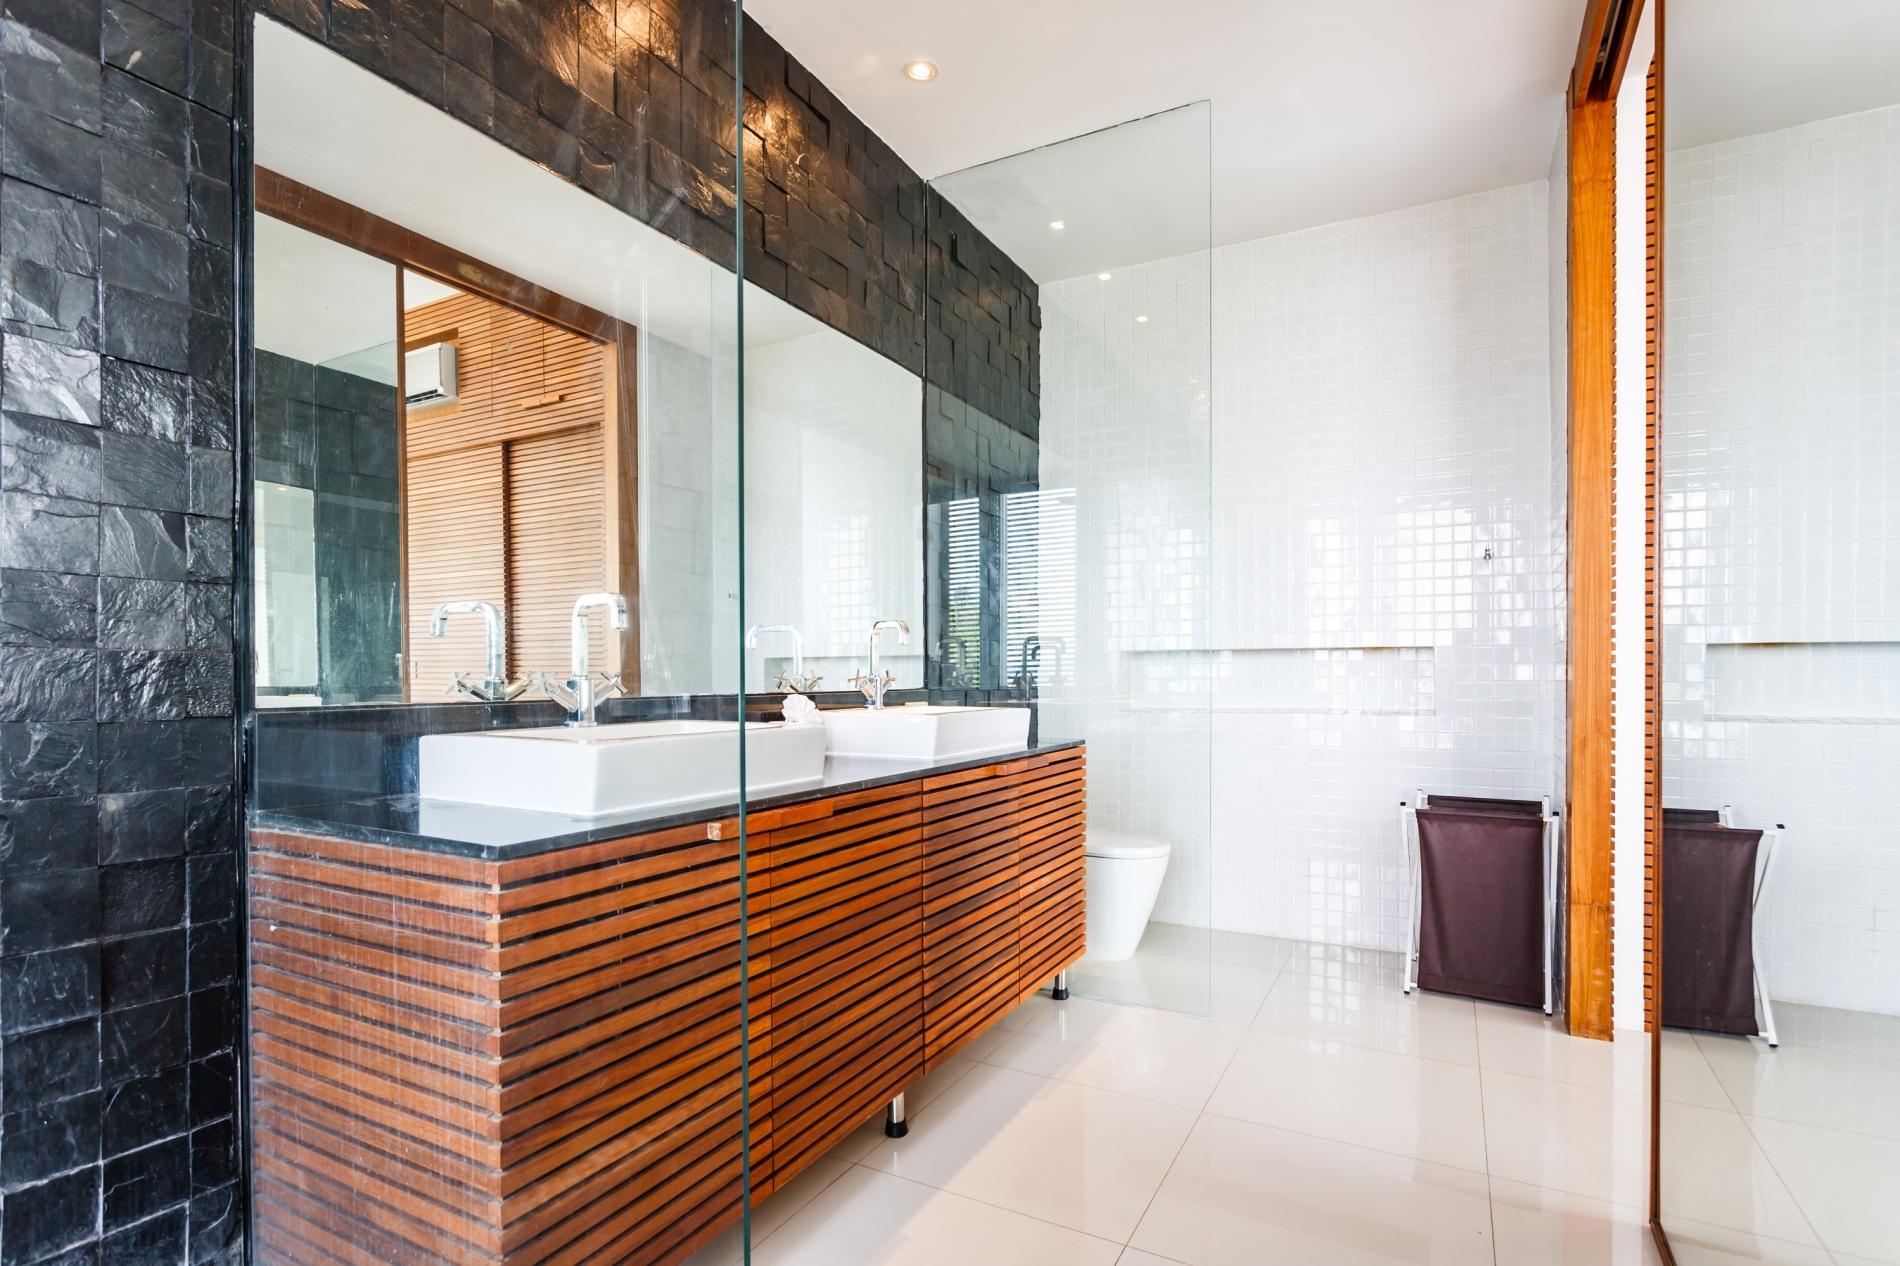 Apartment The Quarter 301 - Luxury Surin 3 bedroom apartment private pool photo 20176522